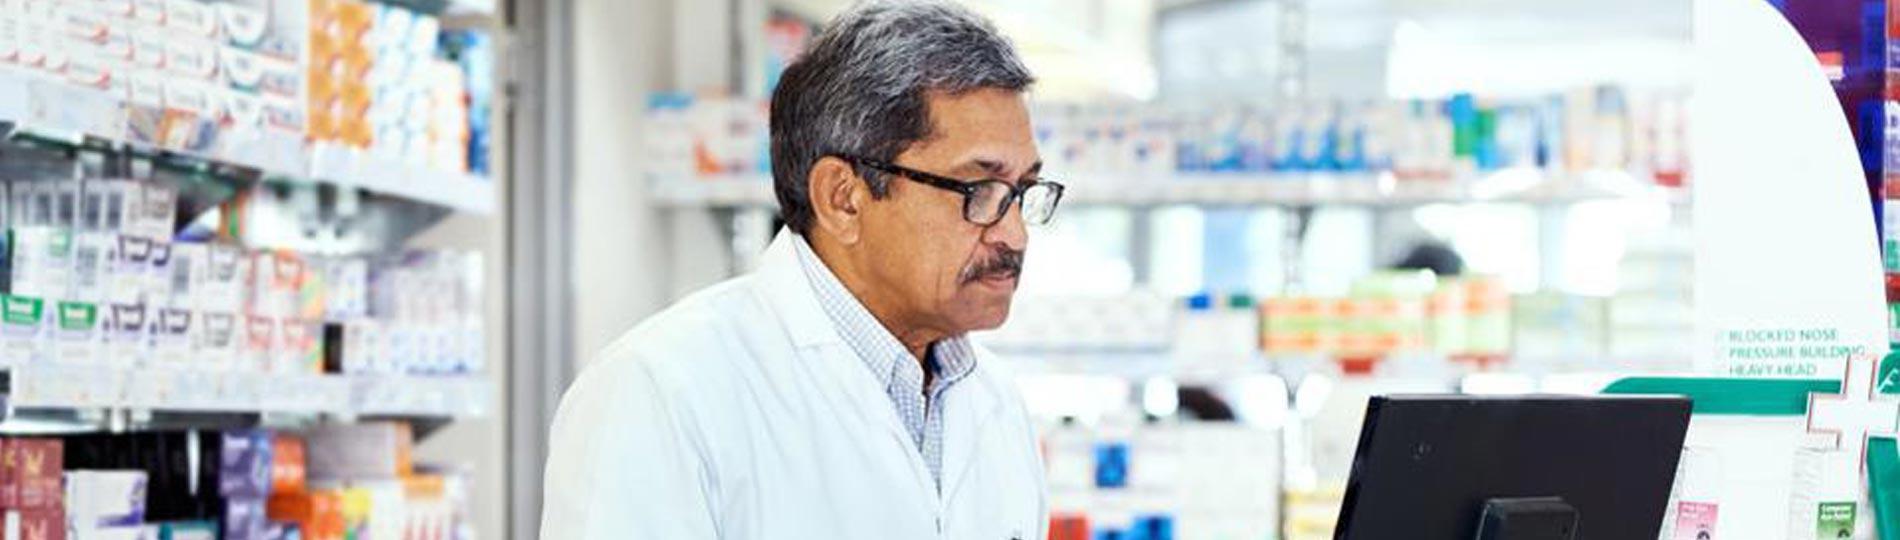 The future of pharma: The role of biotech companies